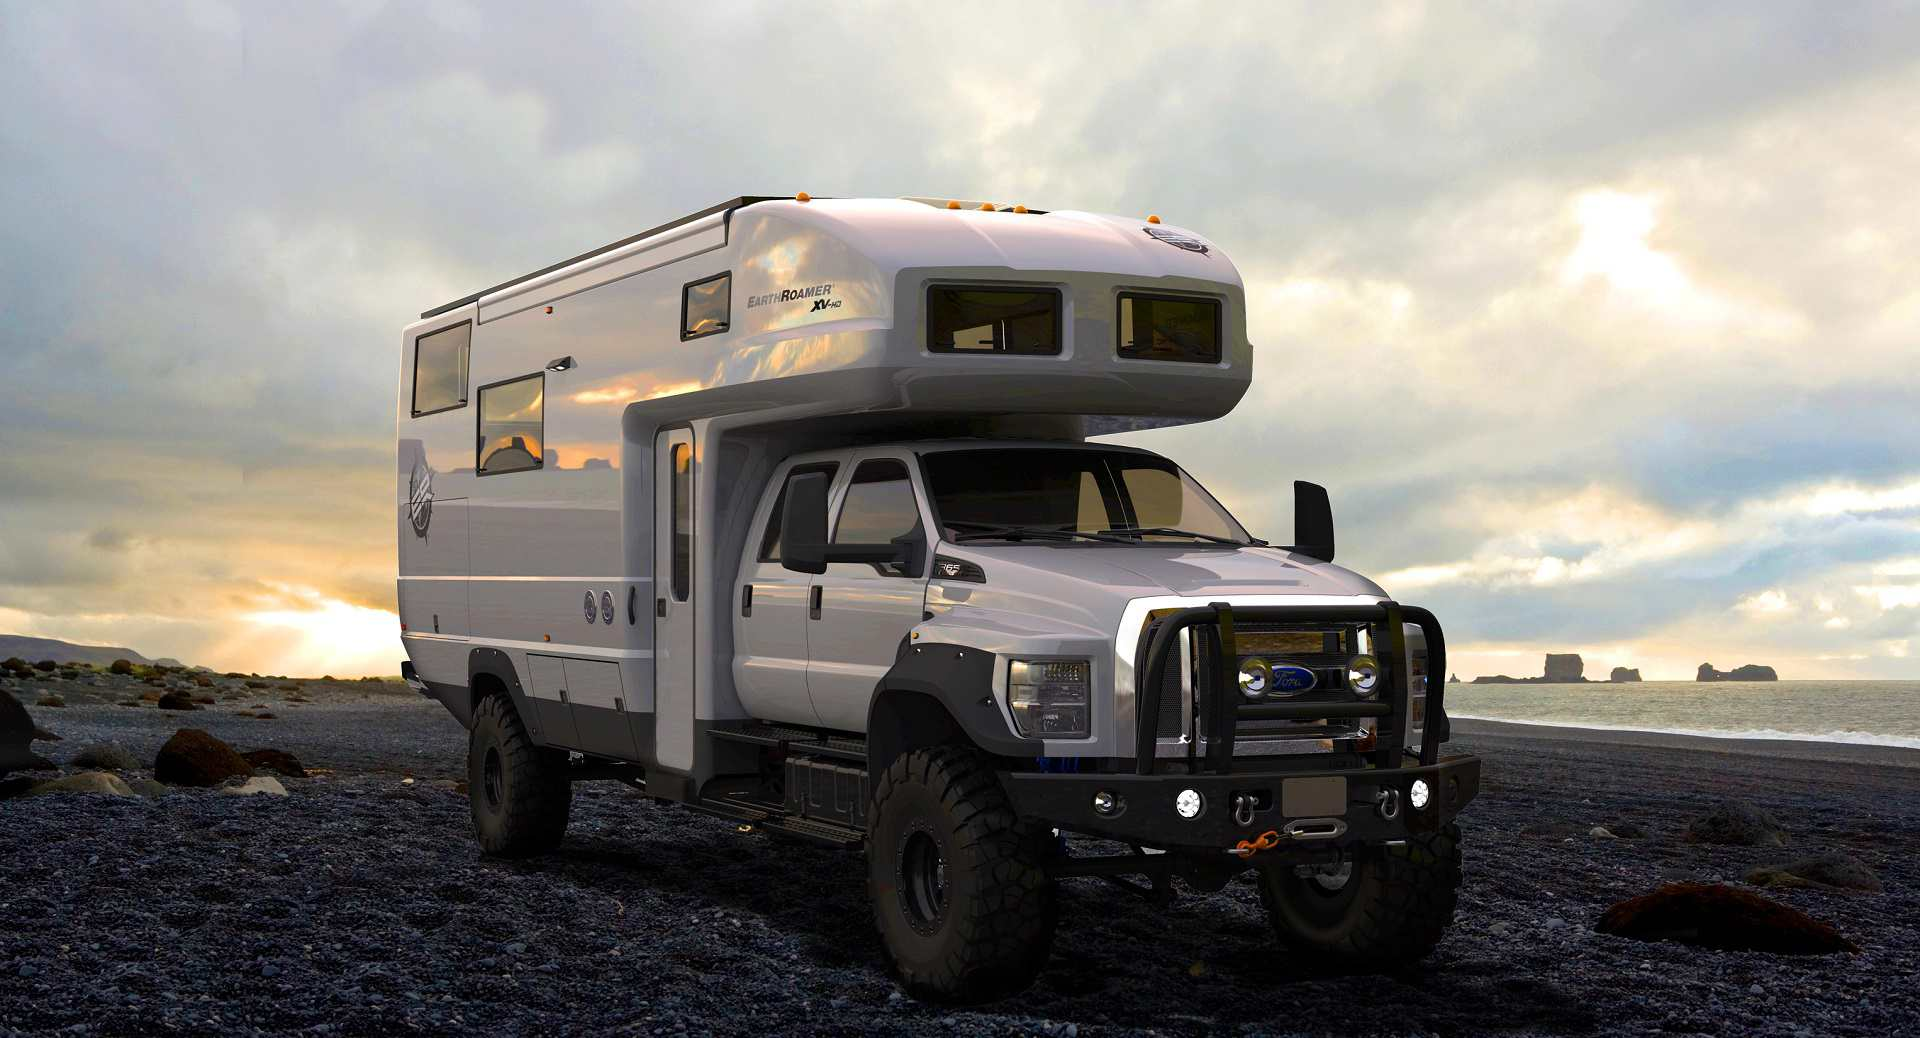 5 RVs to Survive a Zombie Apocalypse